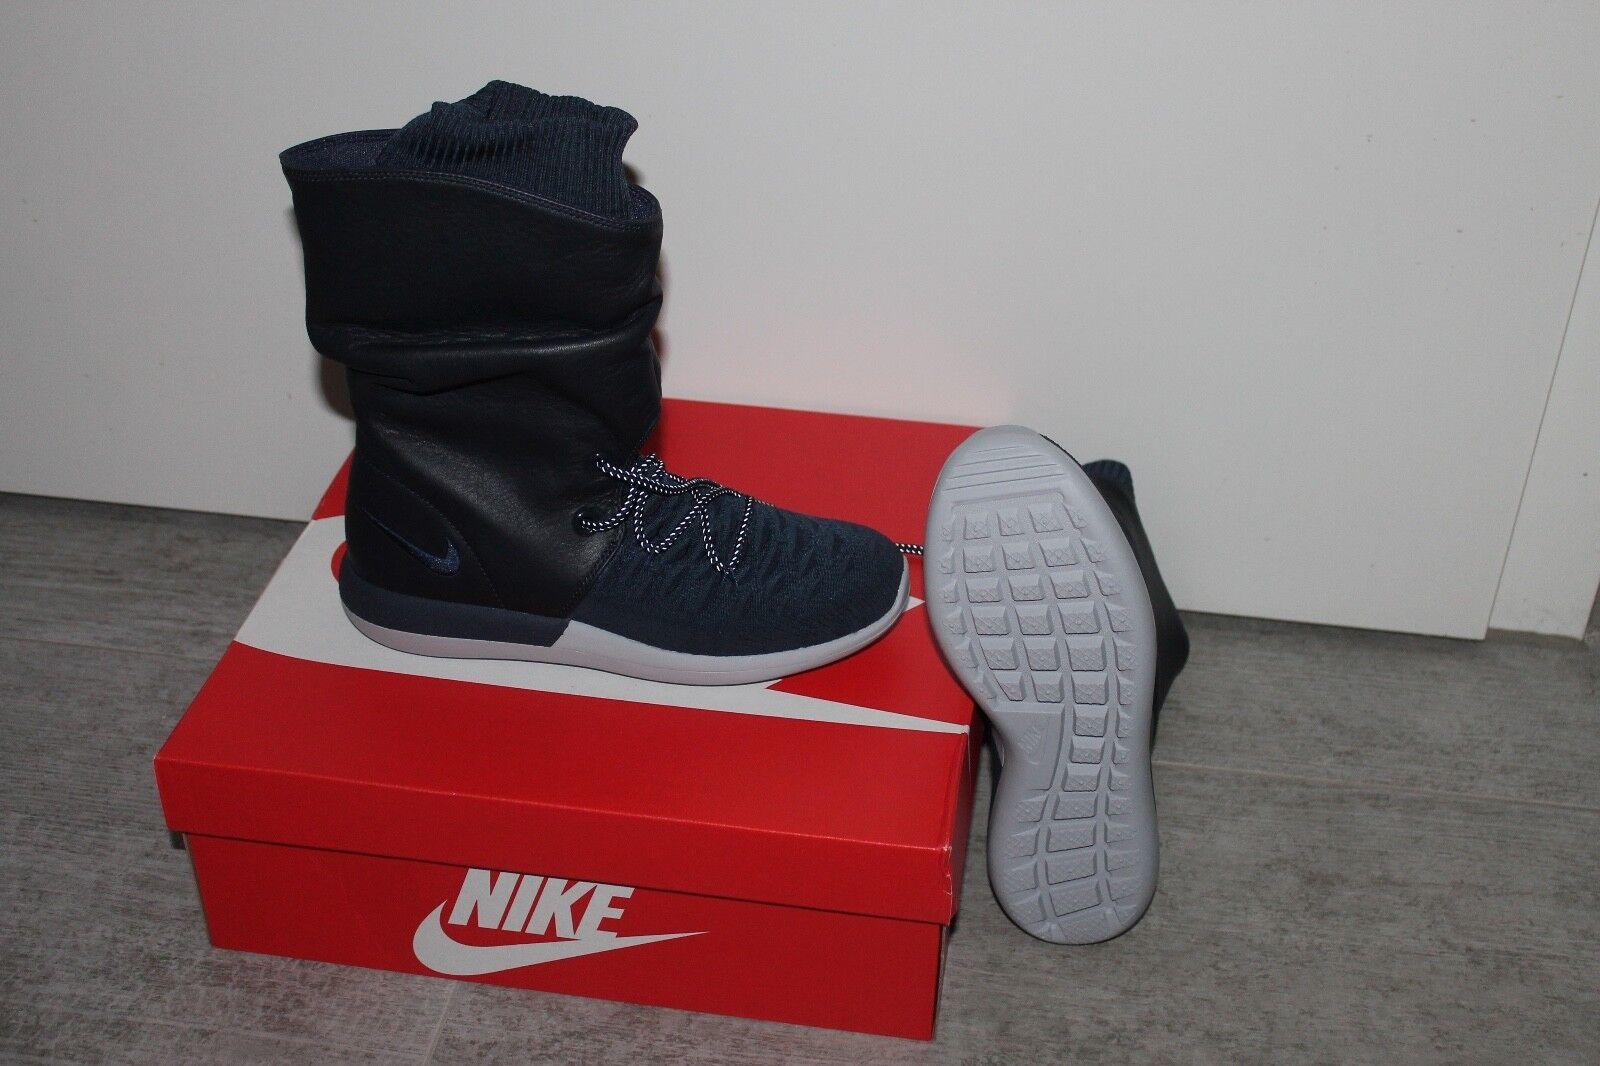 Nike Nike Nike Wmns Roshe DOS HI FLYKNIT ZAPATILLAS DEPORTIVAS de mujer Zapato Botas Azul 034f66